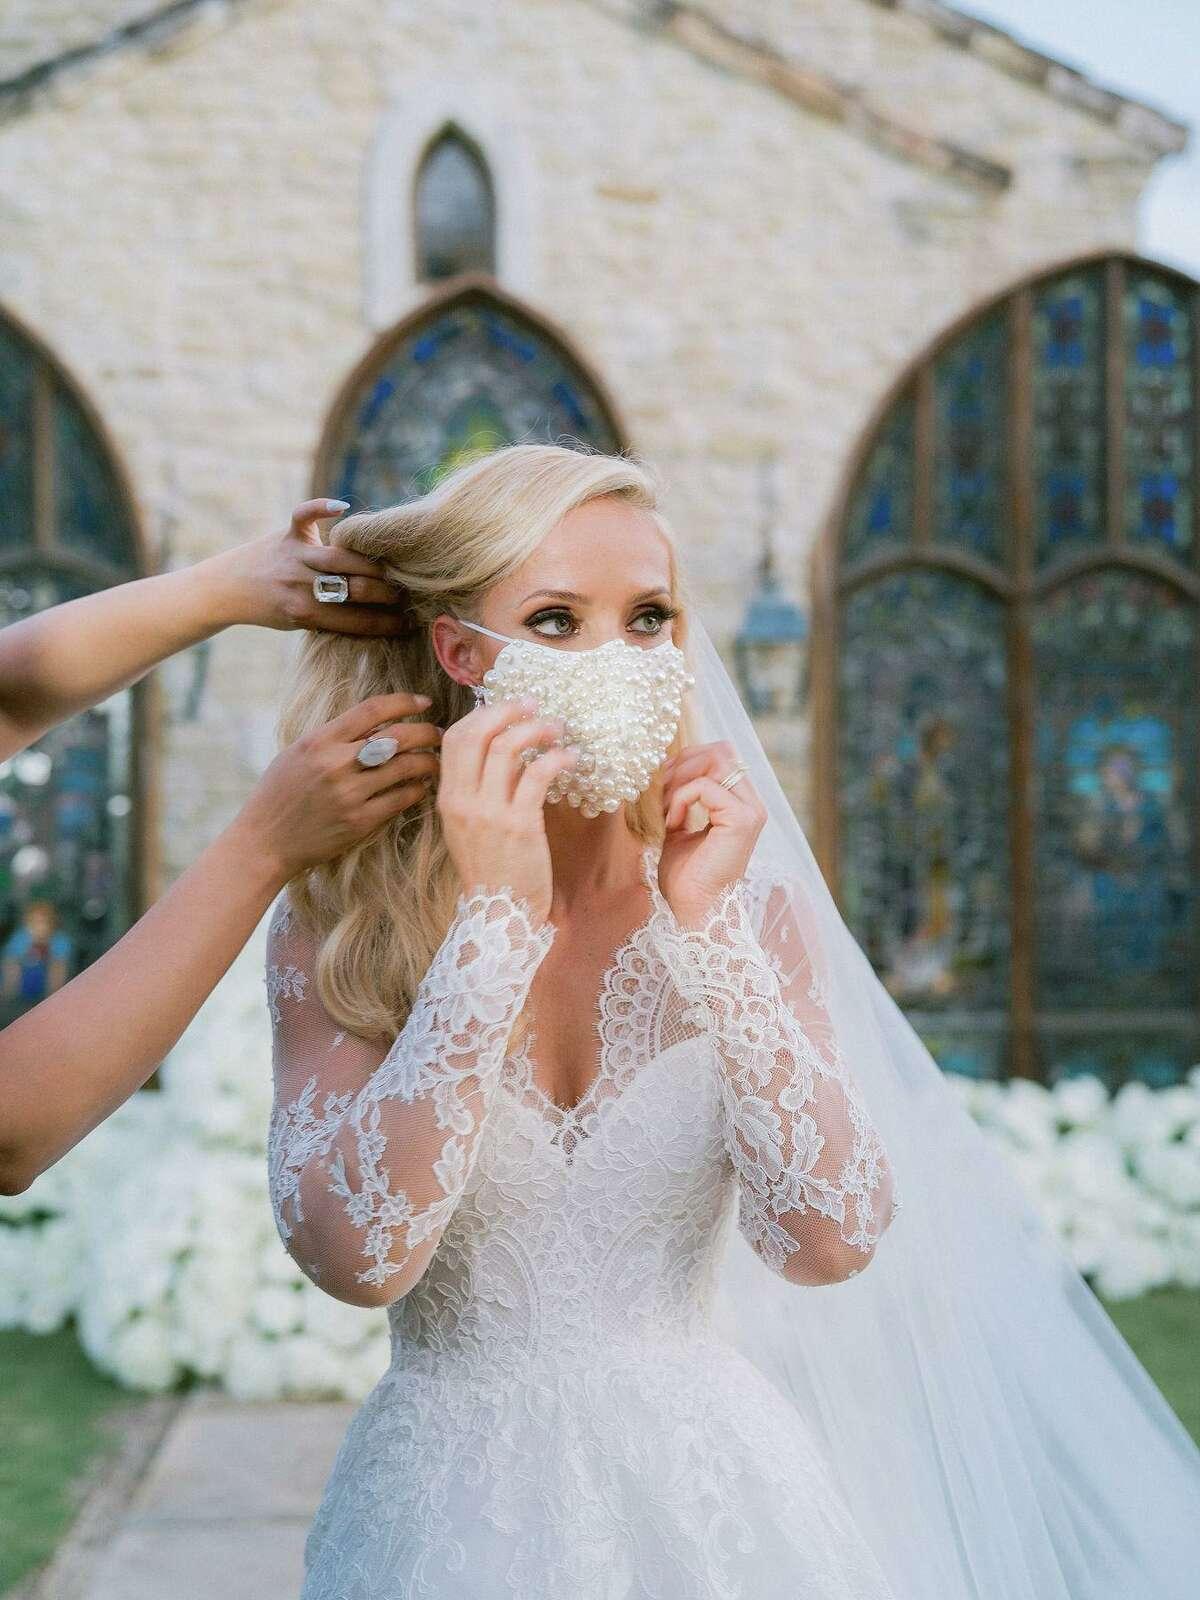 Dr. Elizabeth McIngvale wore a lace face mask at her July wedding. Maison de Carine carries bridal masks, $65, at maisondecarine.com